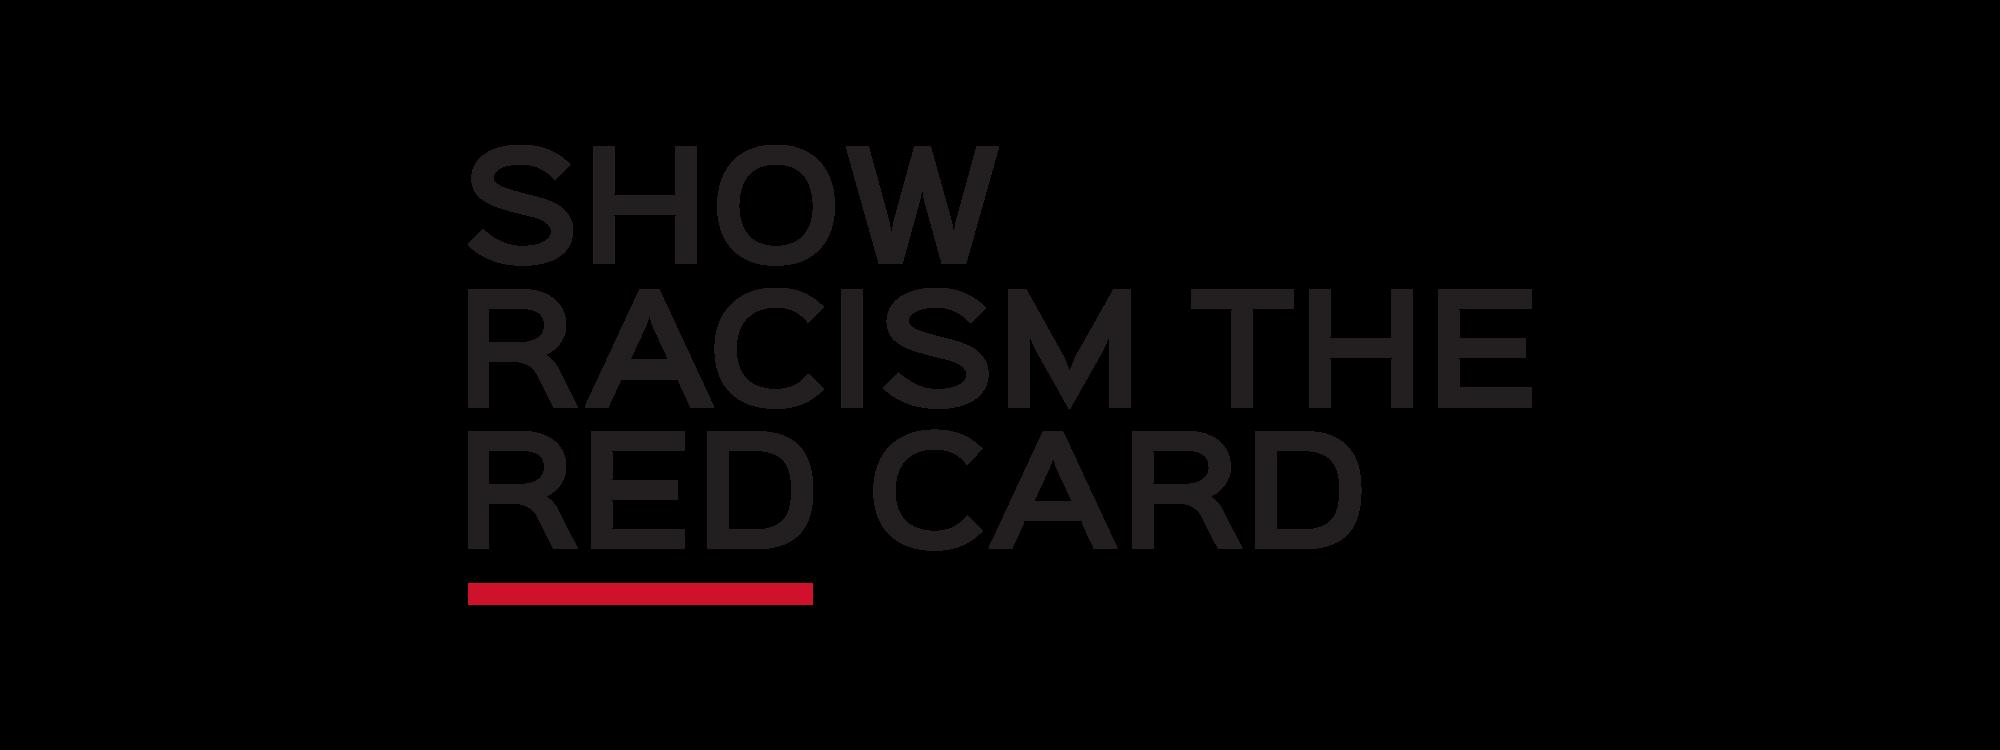 show-racism-the-red-card-logo-2017-design-branding-walnut-wasp.jpg